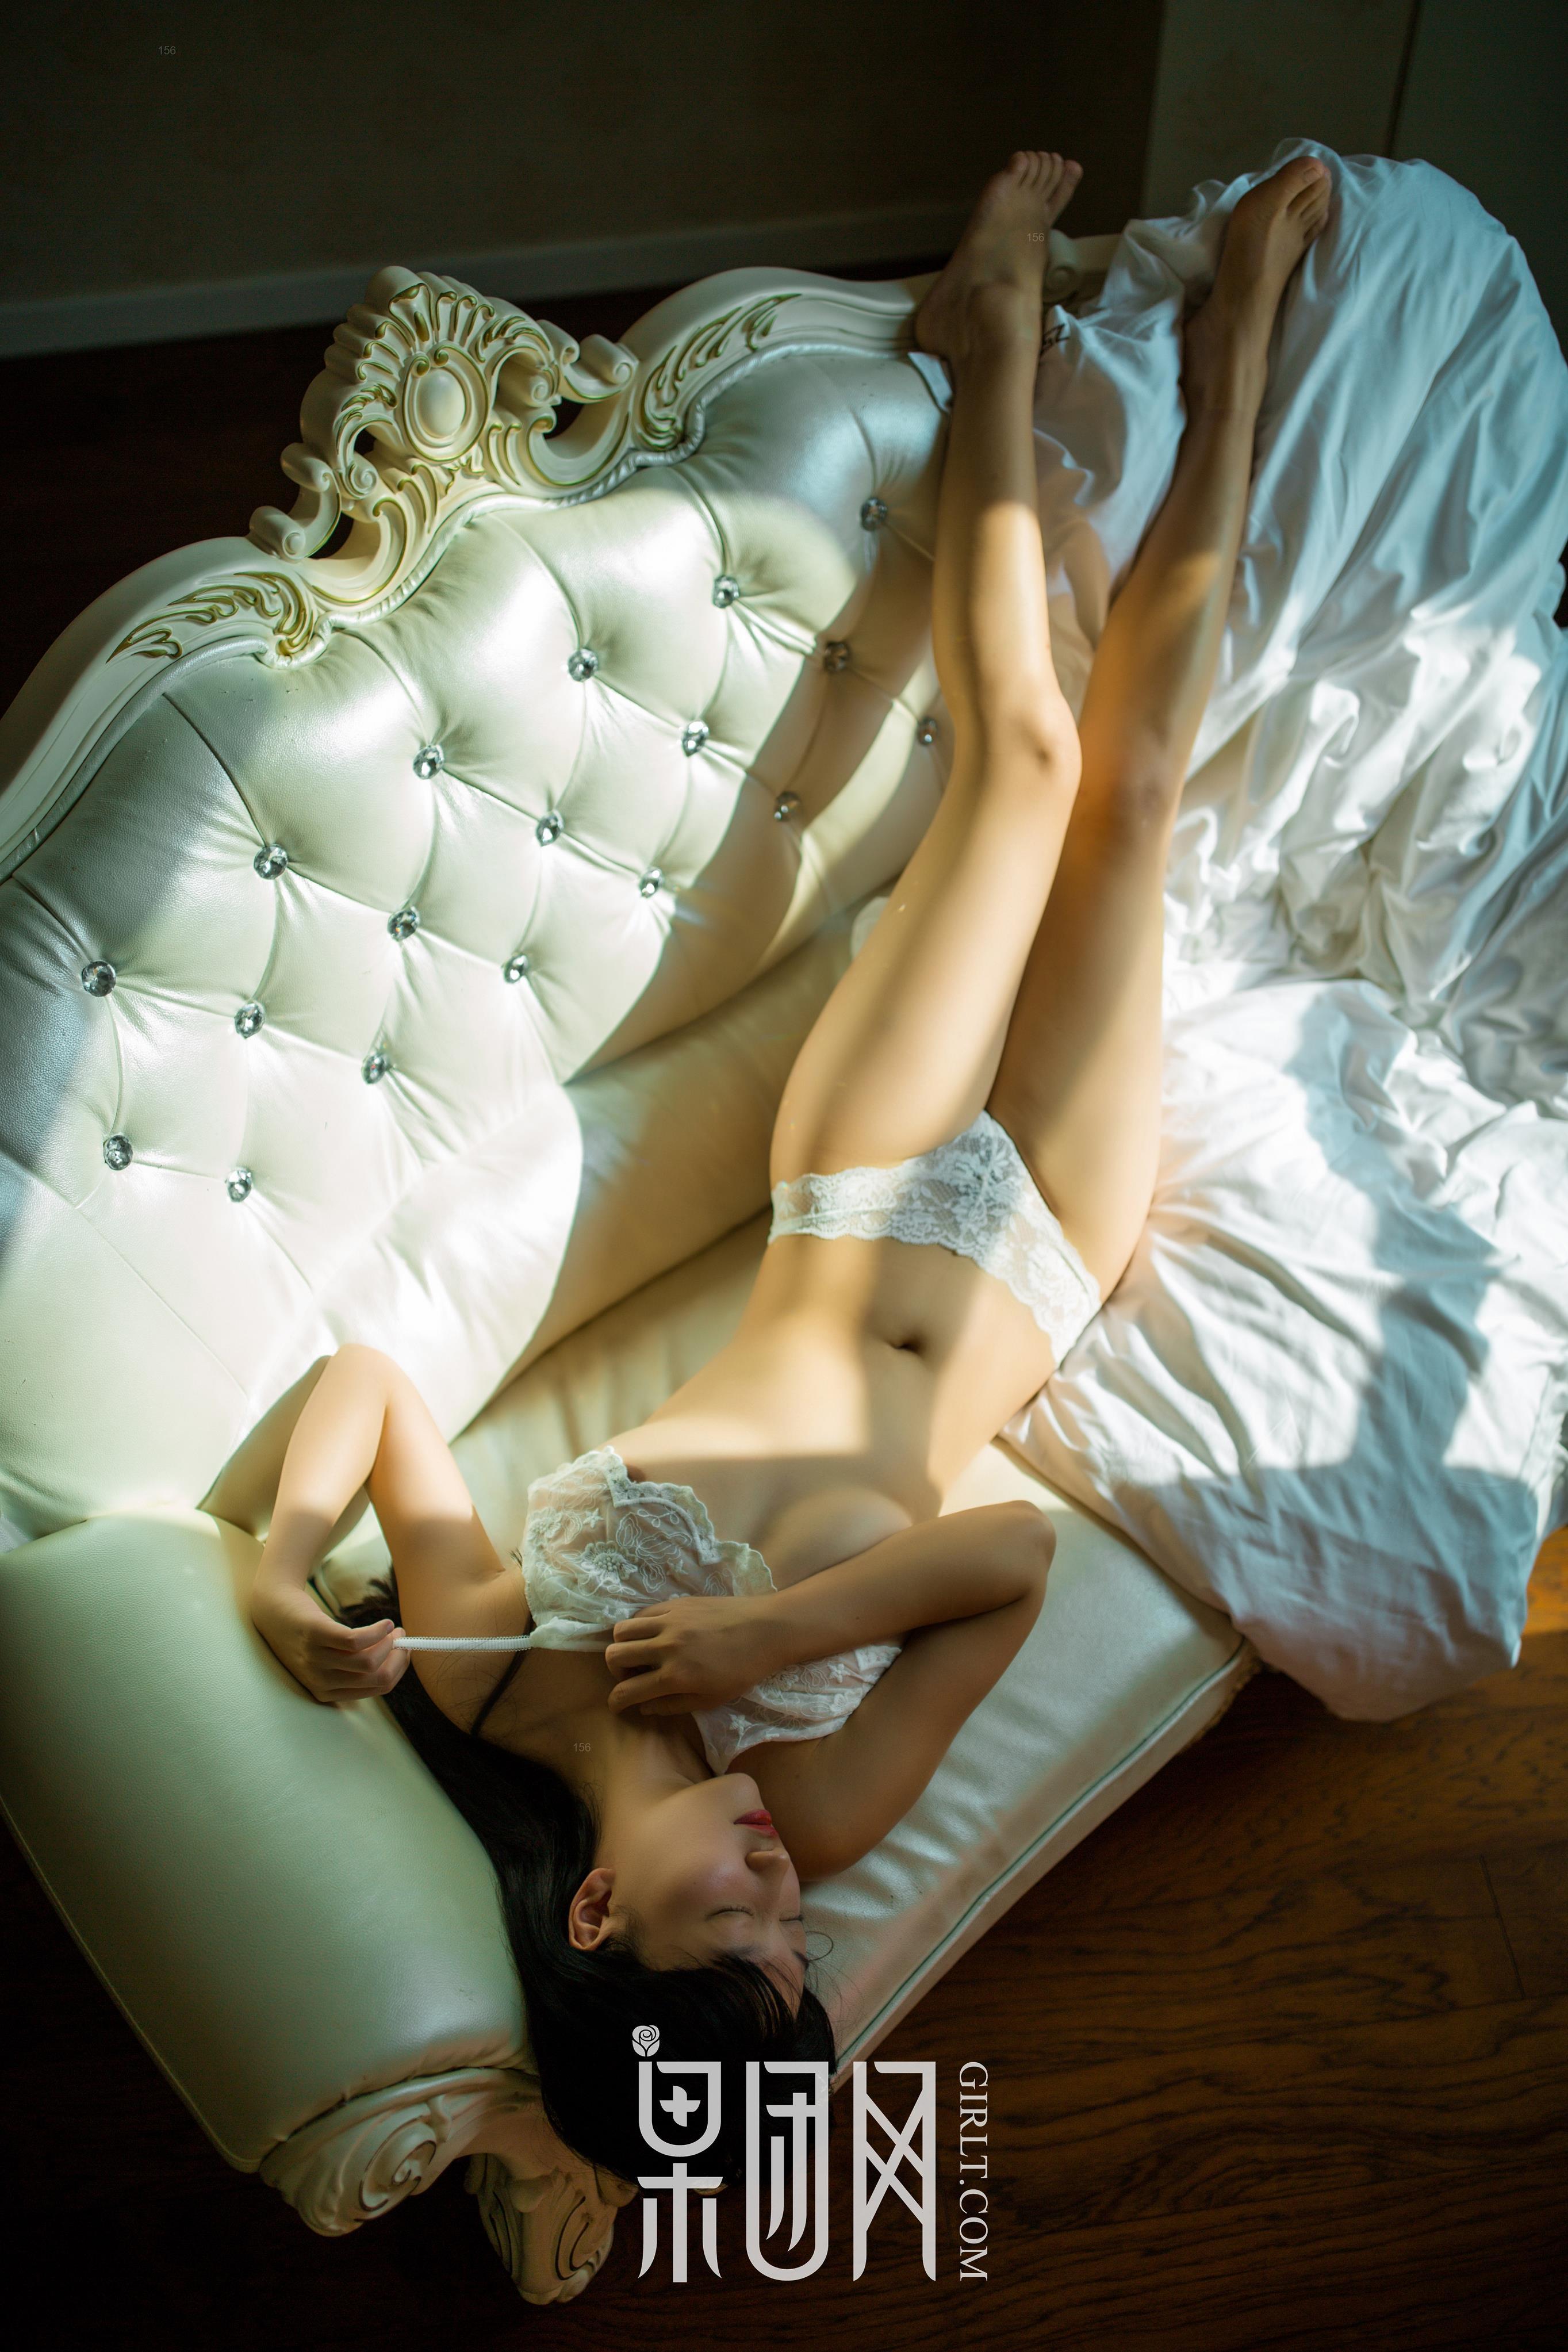 [Girlt果团网]XCJX20180112NO0013 童颜巨乳小萝莉 白色情趣内衣性感私房写真集